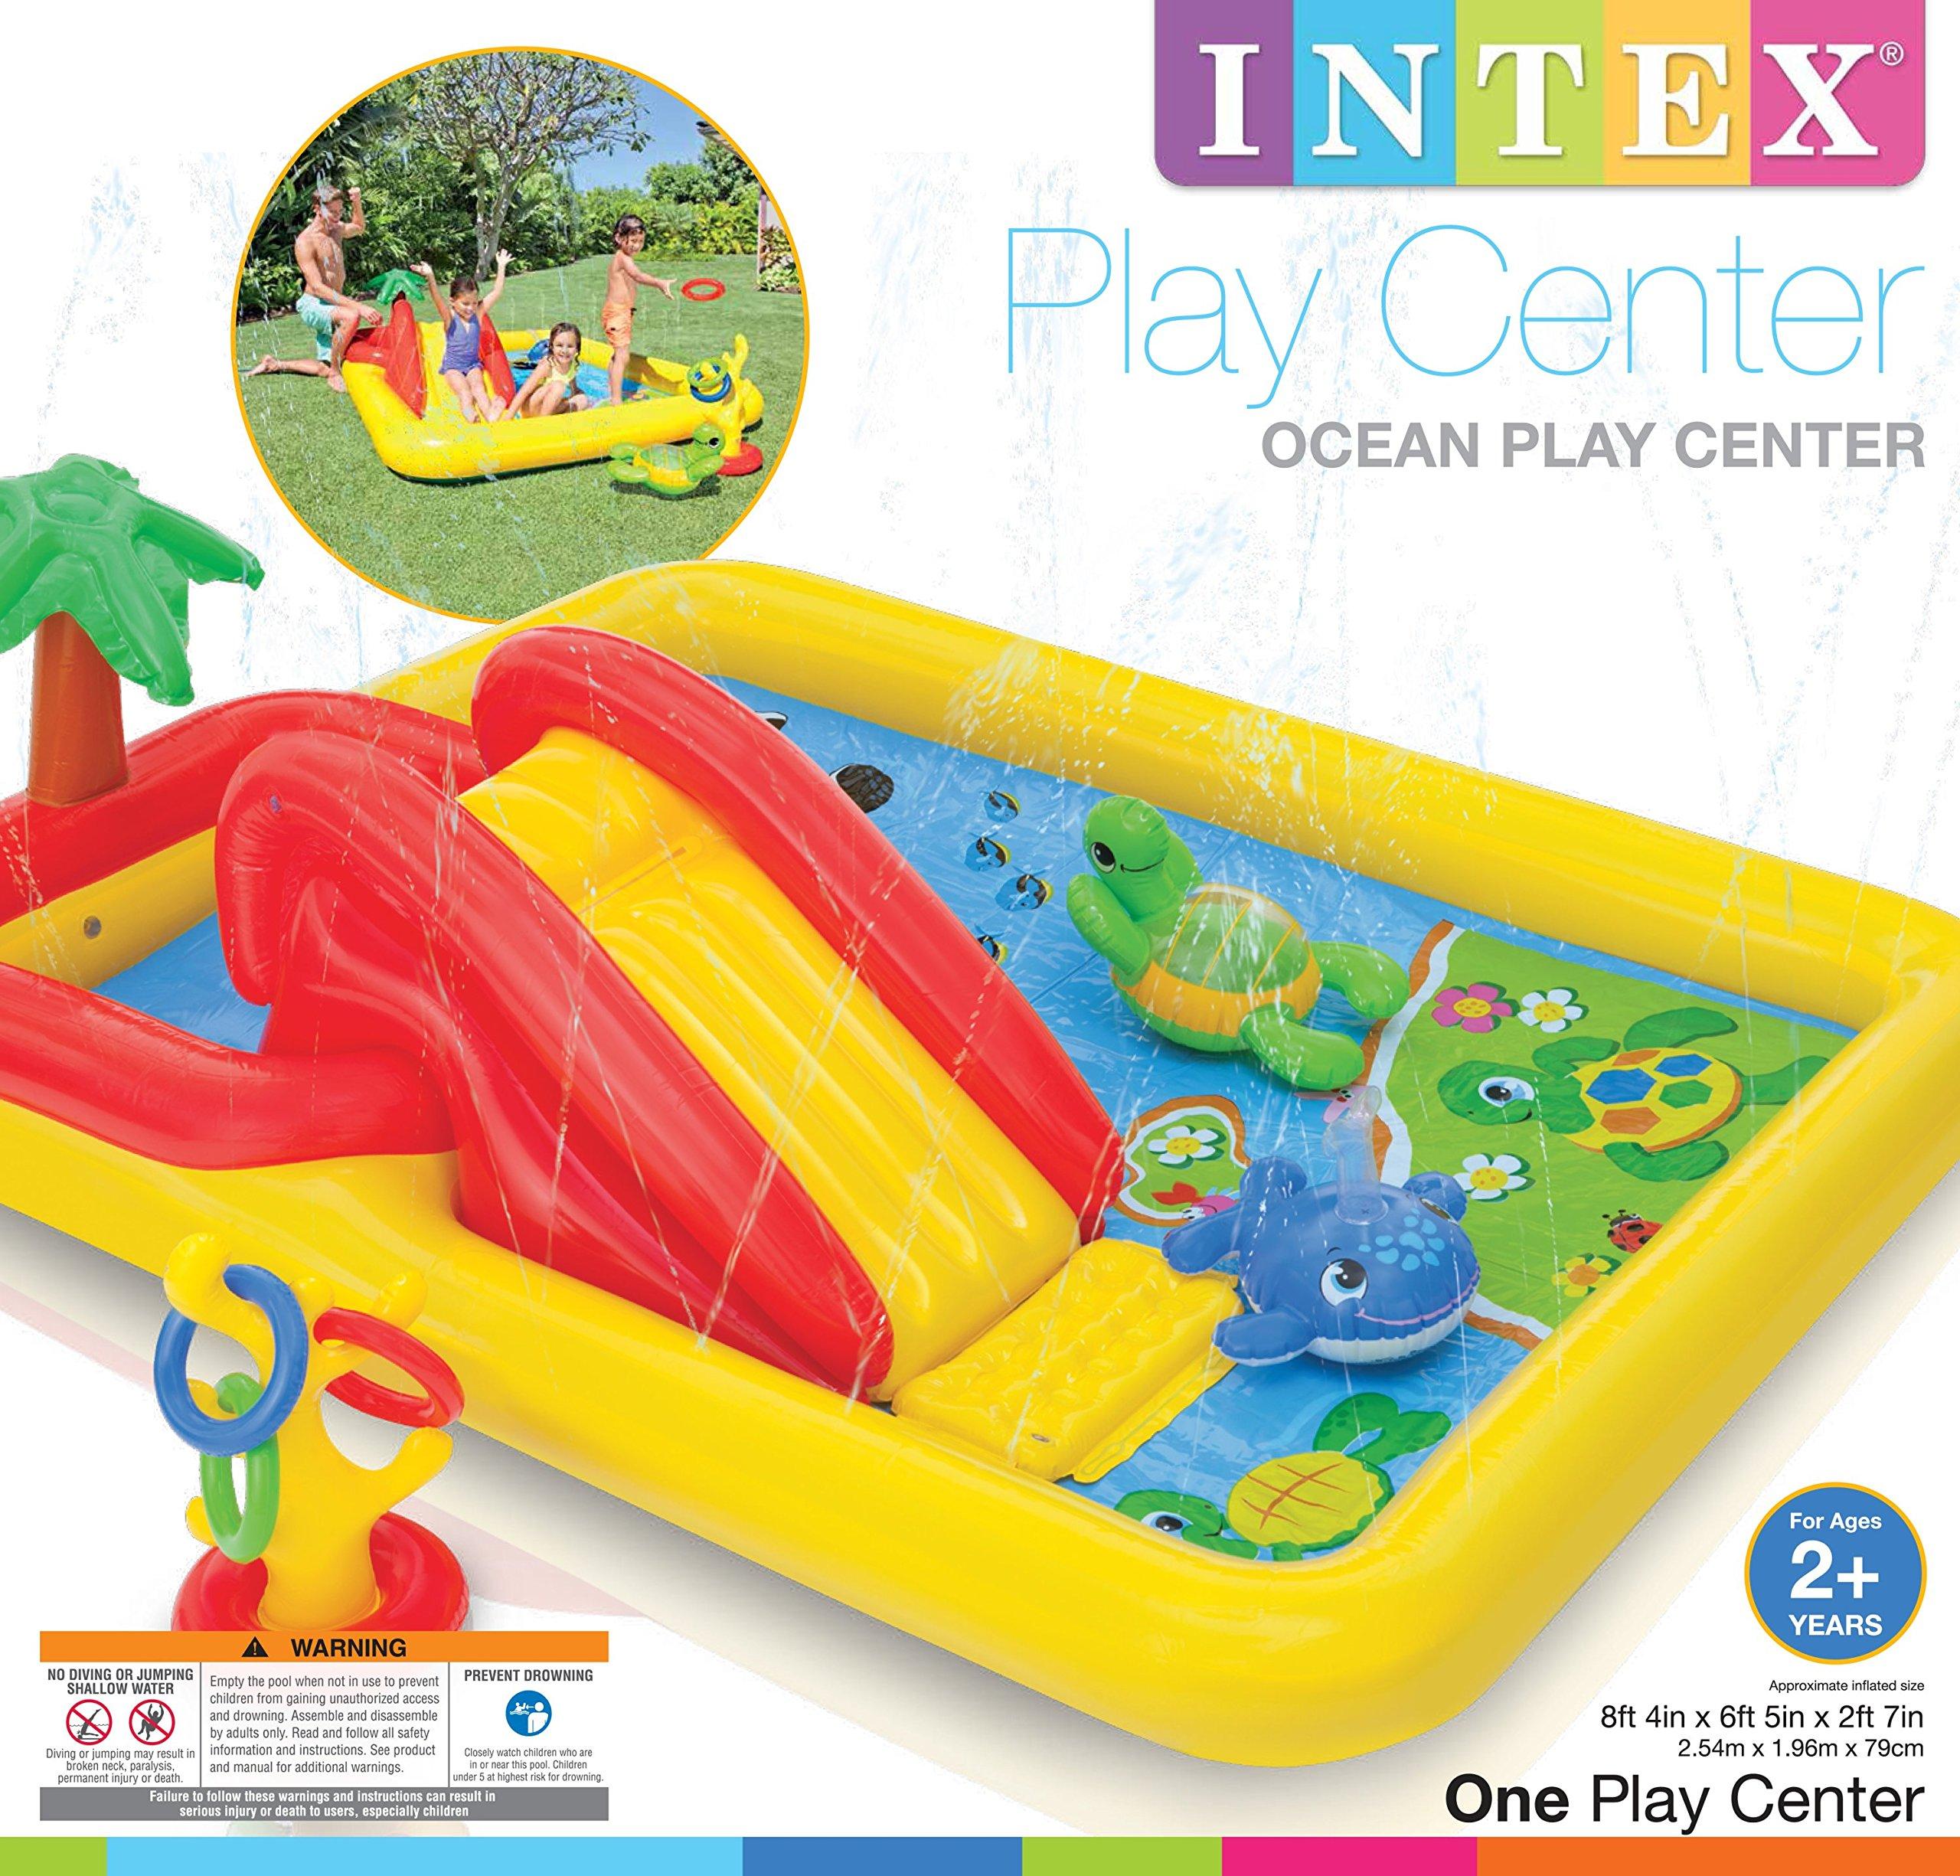 Intex Inflatable Ocean Play Center Kids Backyard Pool (2 Pack) + Air Pump by Intex (Image #9)